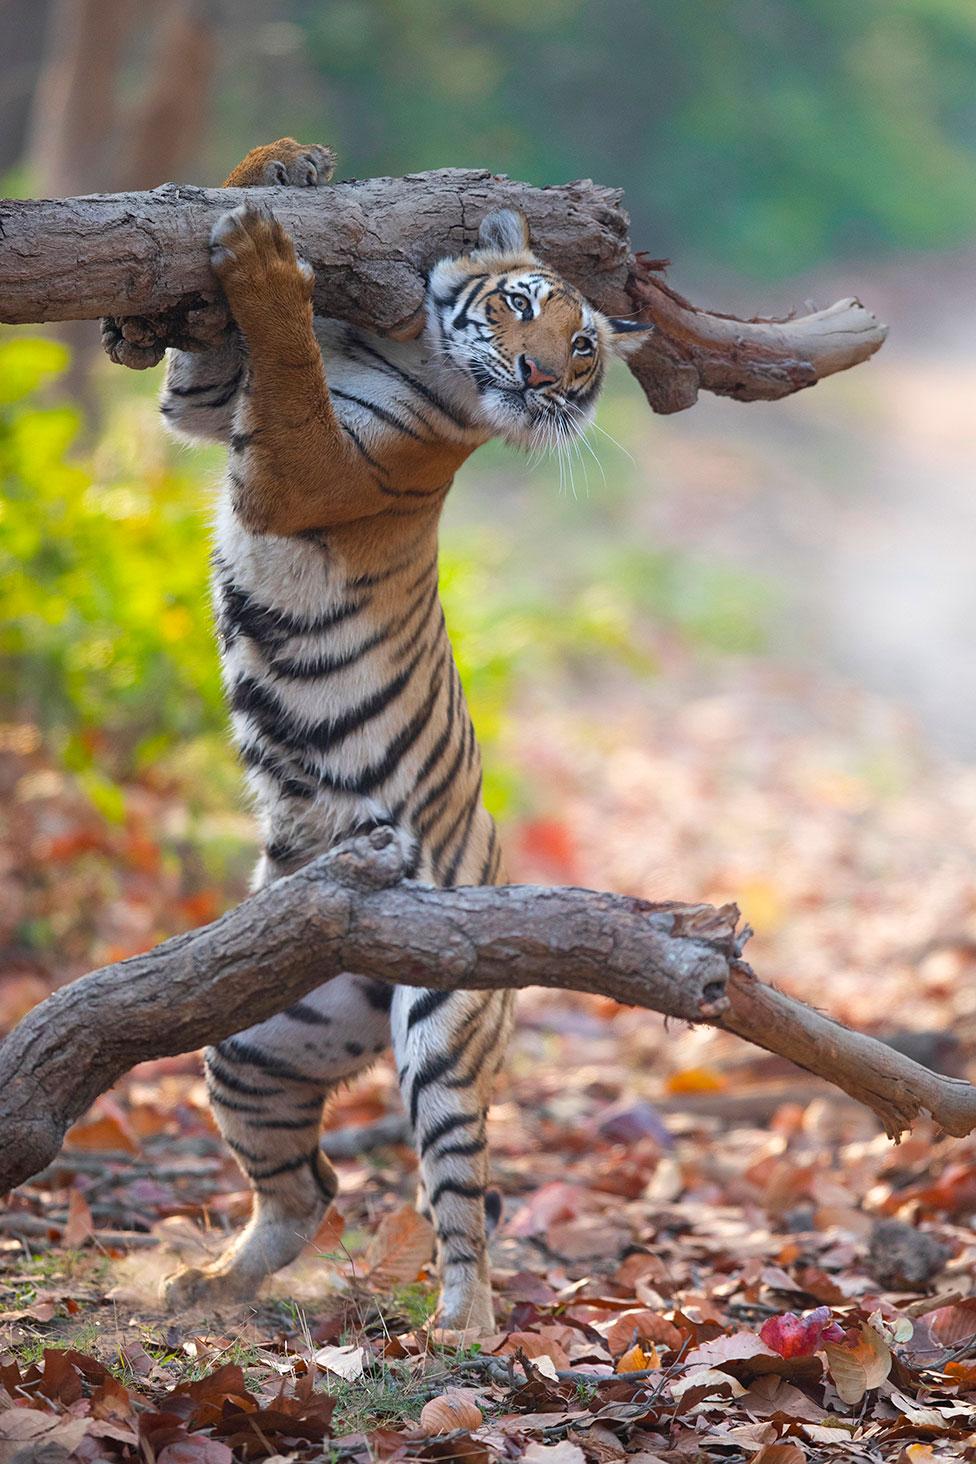 Un tigre se sujeta de una rama